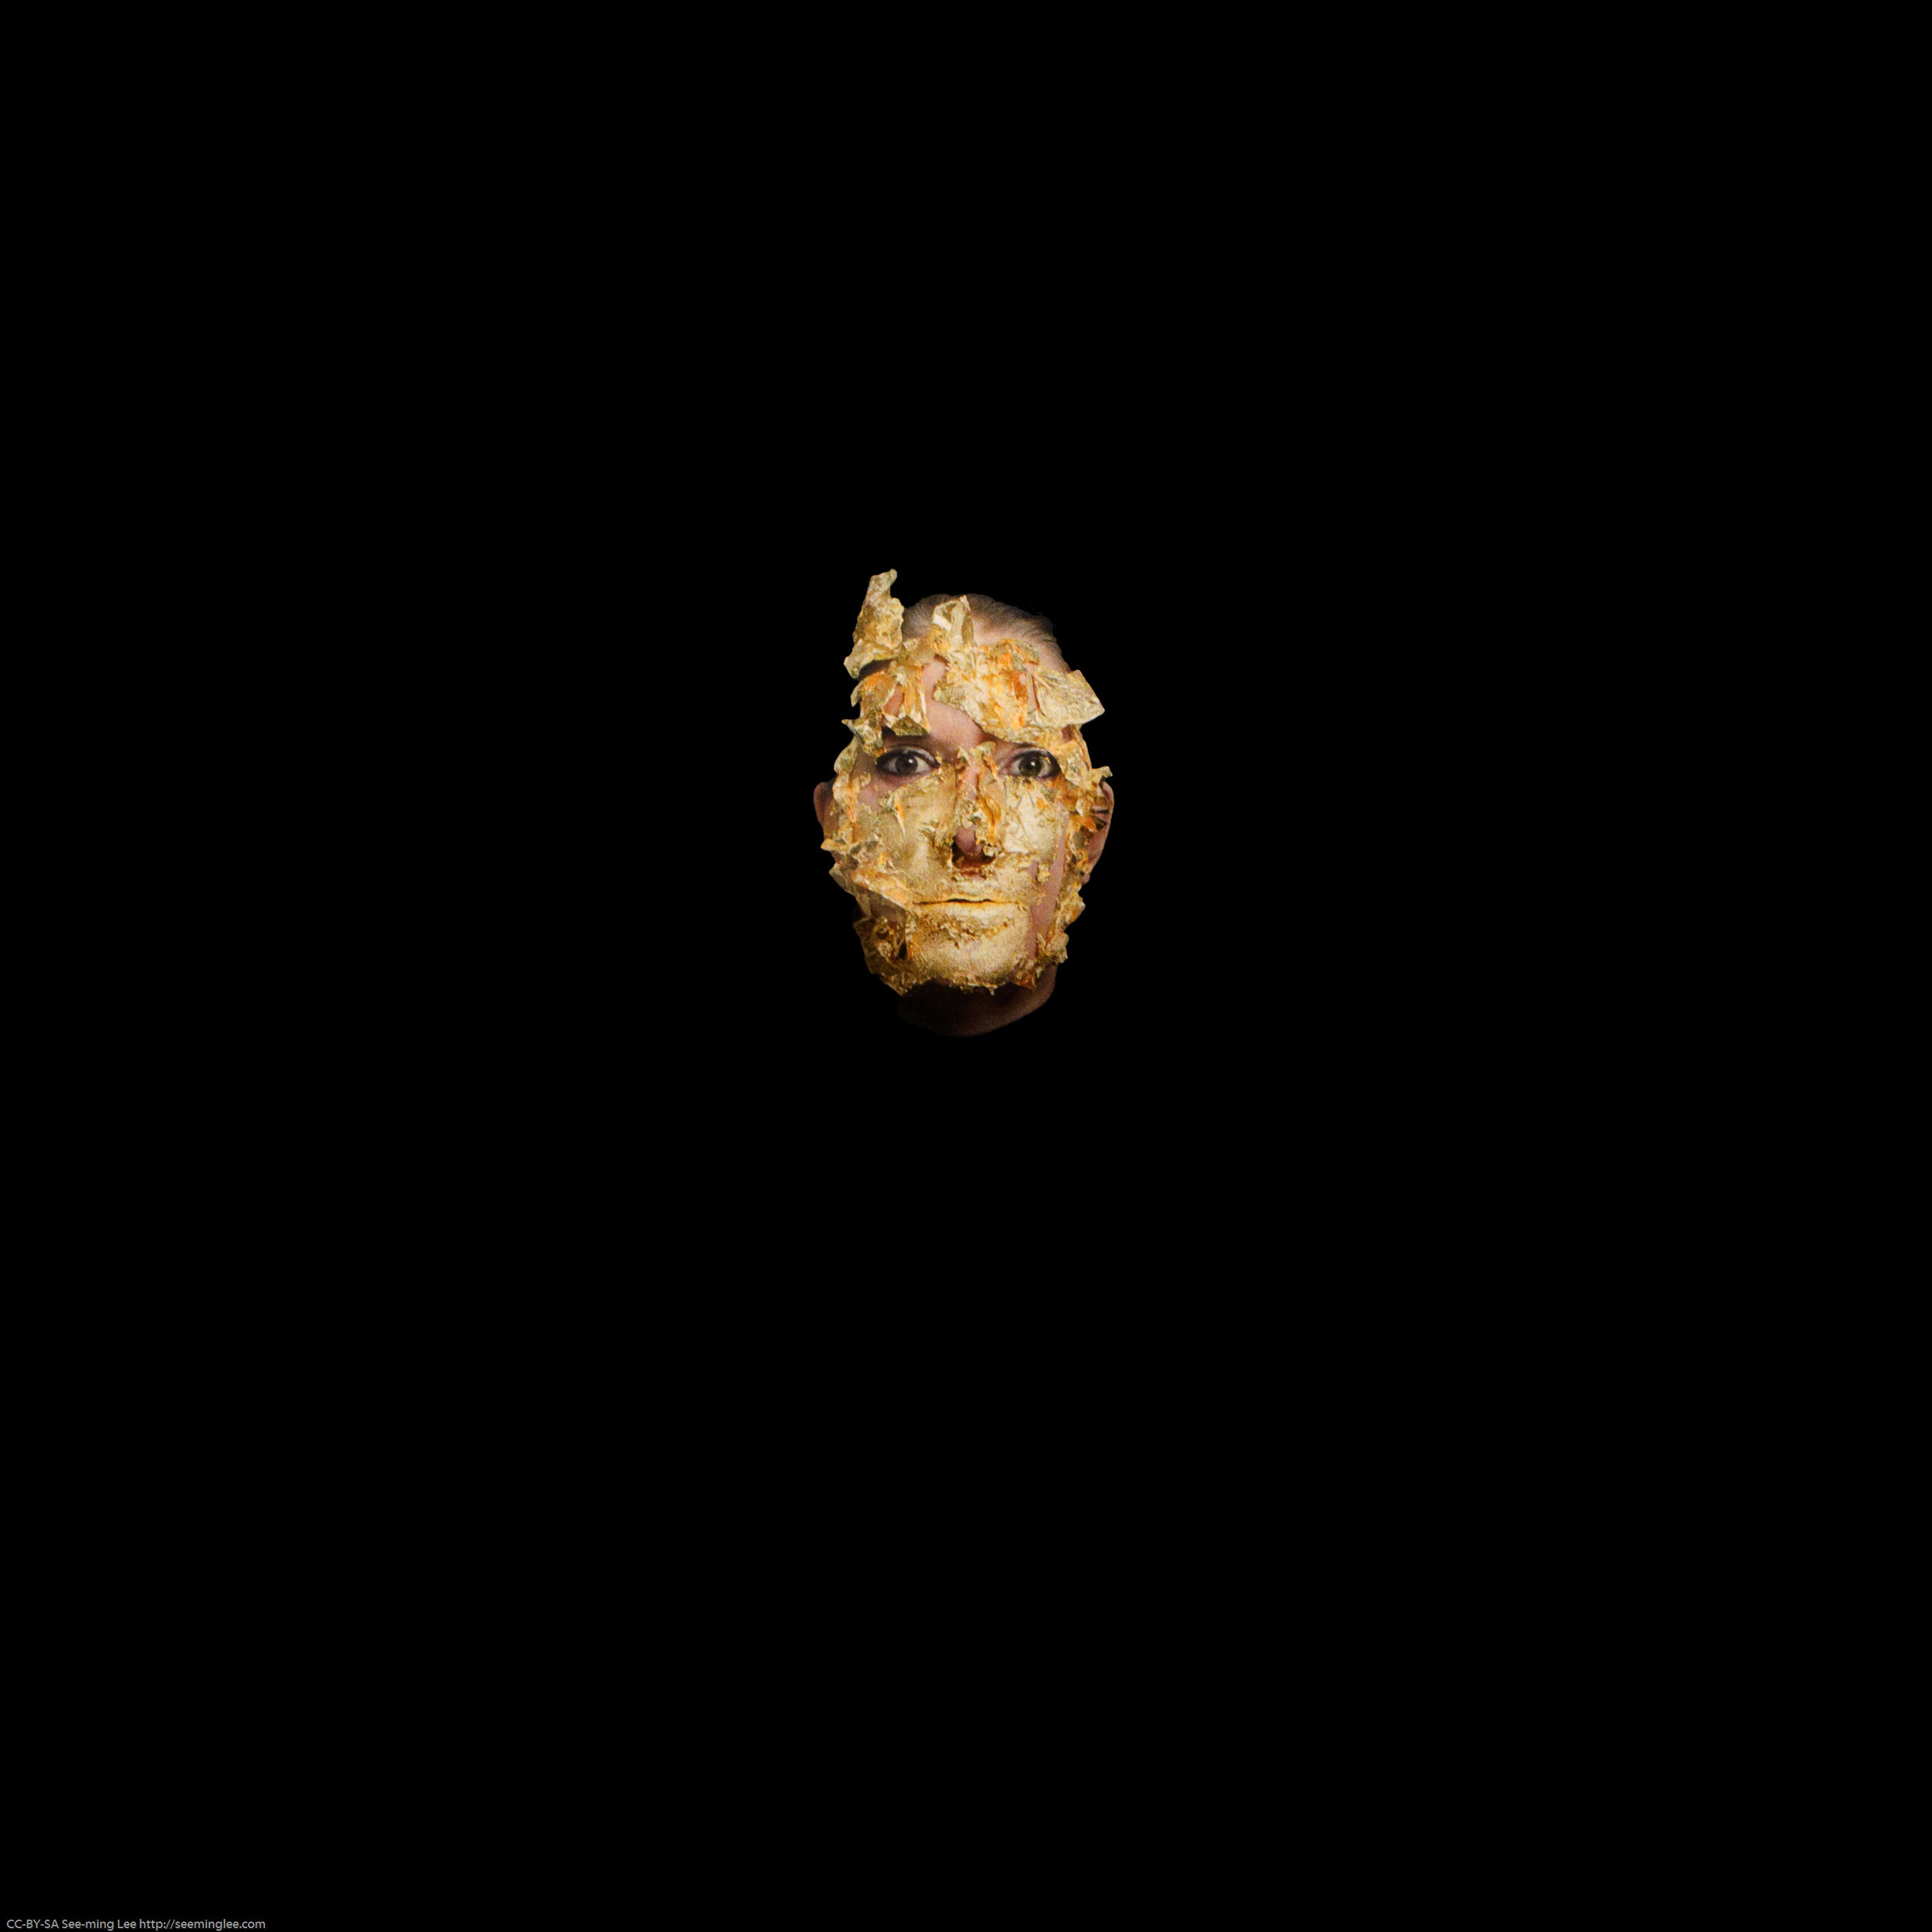 Marina Abramović,  Golden Mask  (2009), Lia Rumma Galleria.